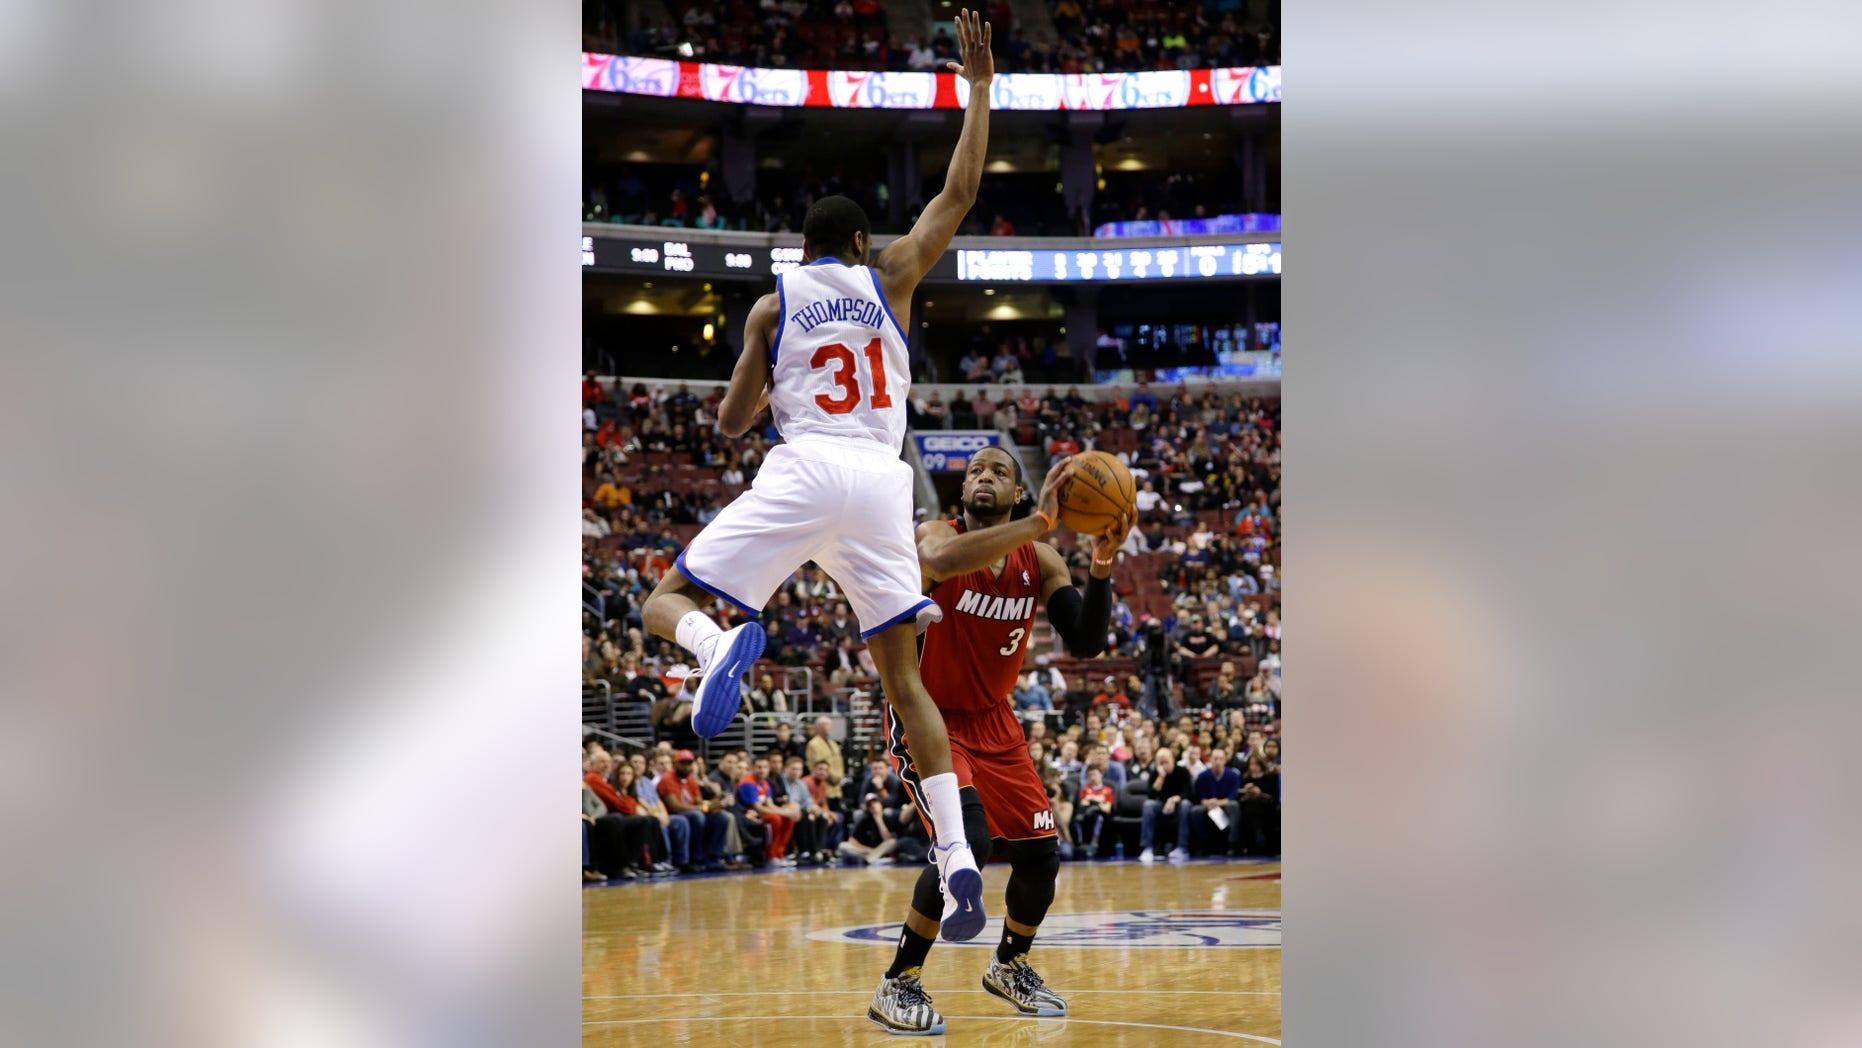 Miami Heat's Dwyane Wade (3) prepares to shoot against Philadelphia 76ers' Hollis Thompson (31) during the first half of an NBA basketball game on Friday, Jan. 17, 2014, in Philadelphia. (AP Photo/Matt Slocum)